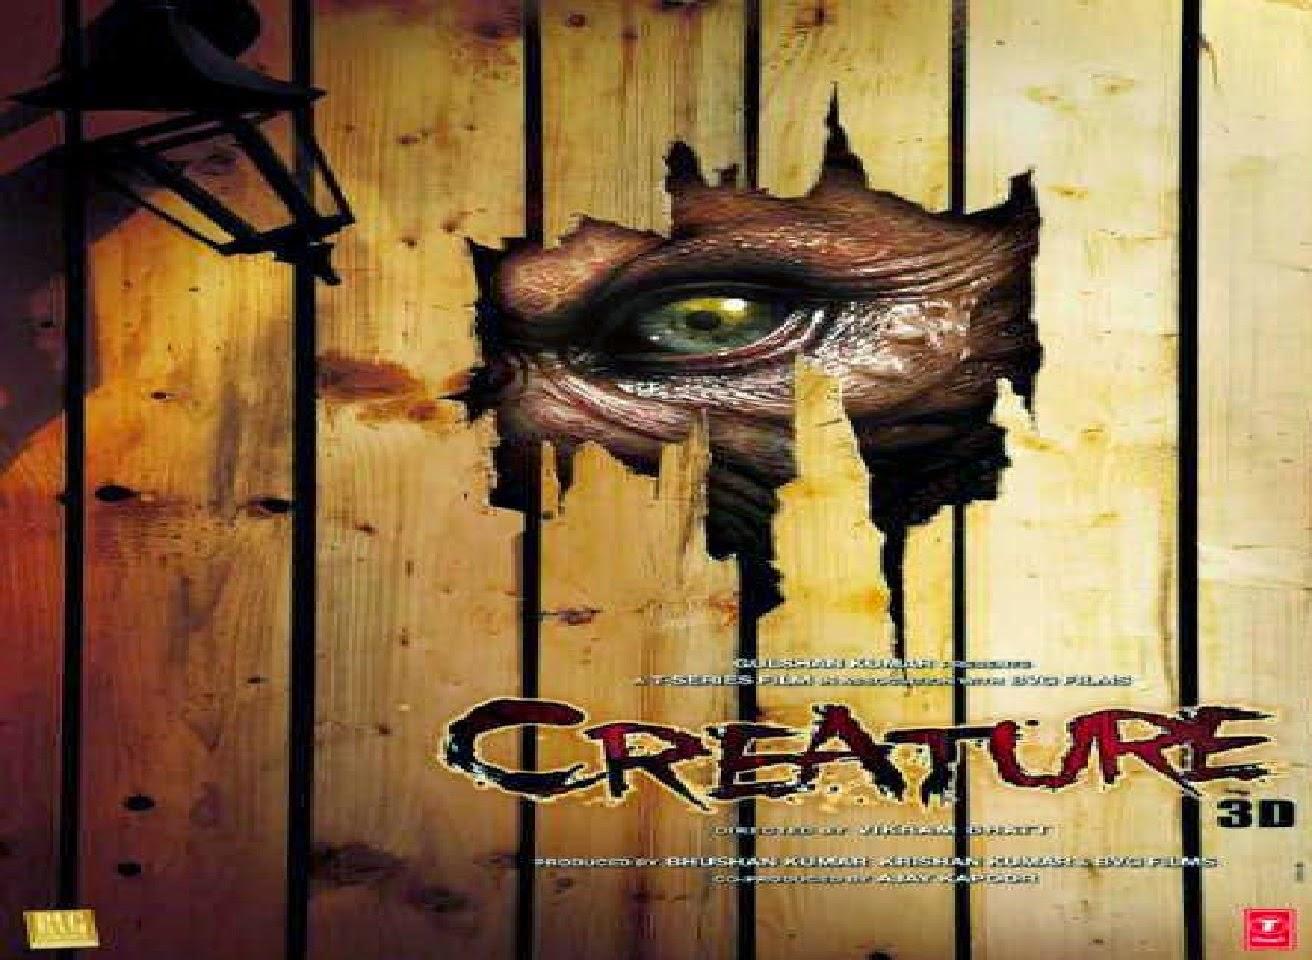 Hum Na Rahein Hum - Benny Dayal - Creature 3D - Song Lyrics | MP3 VIDEO DOWNLOAD